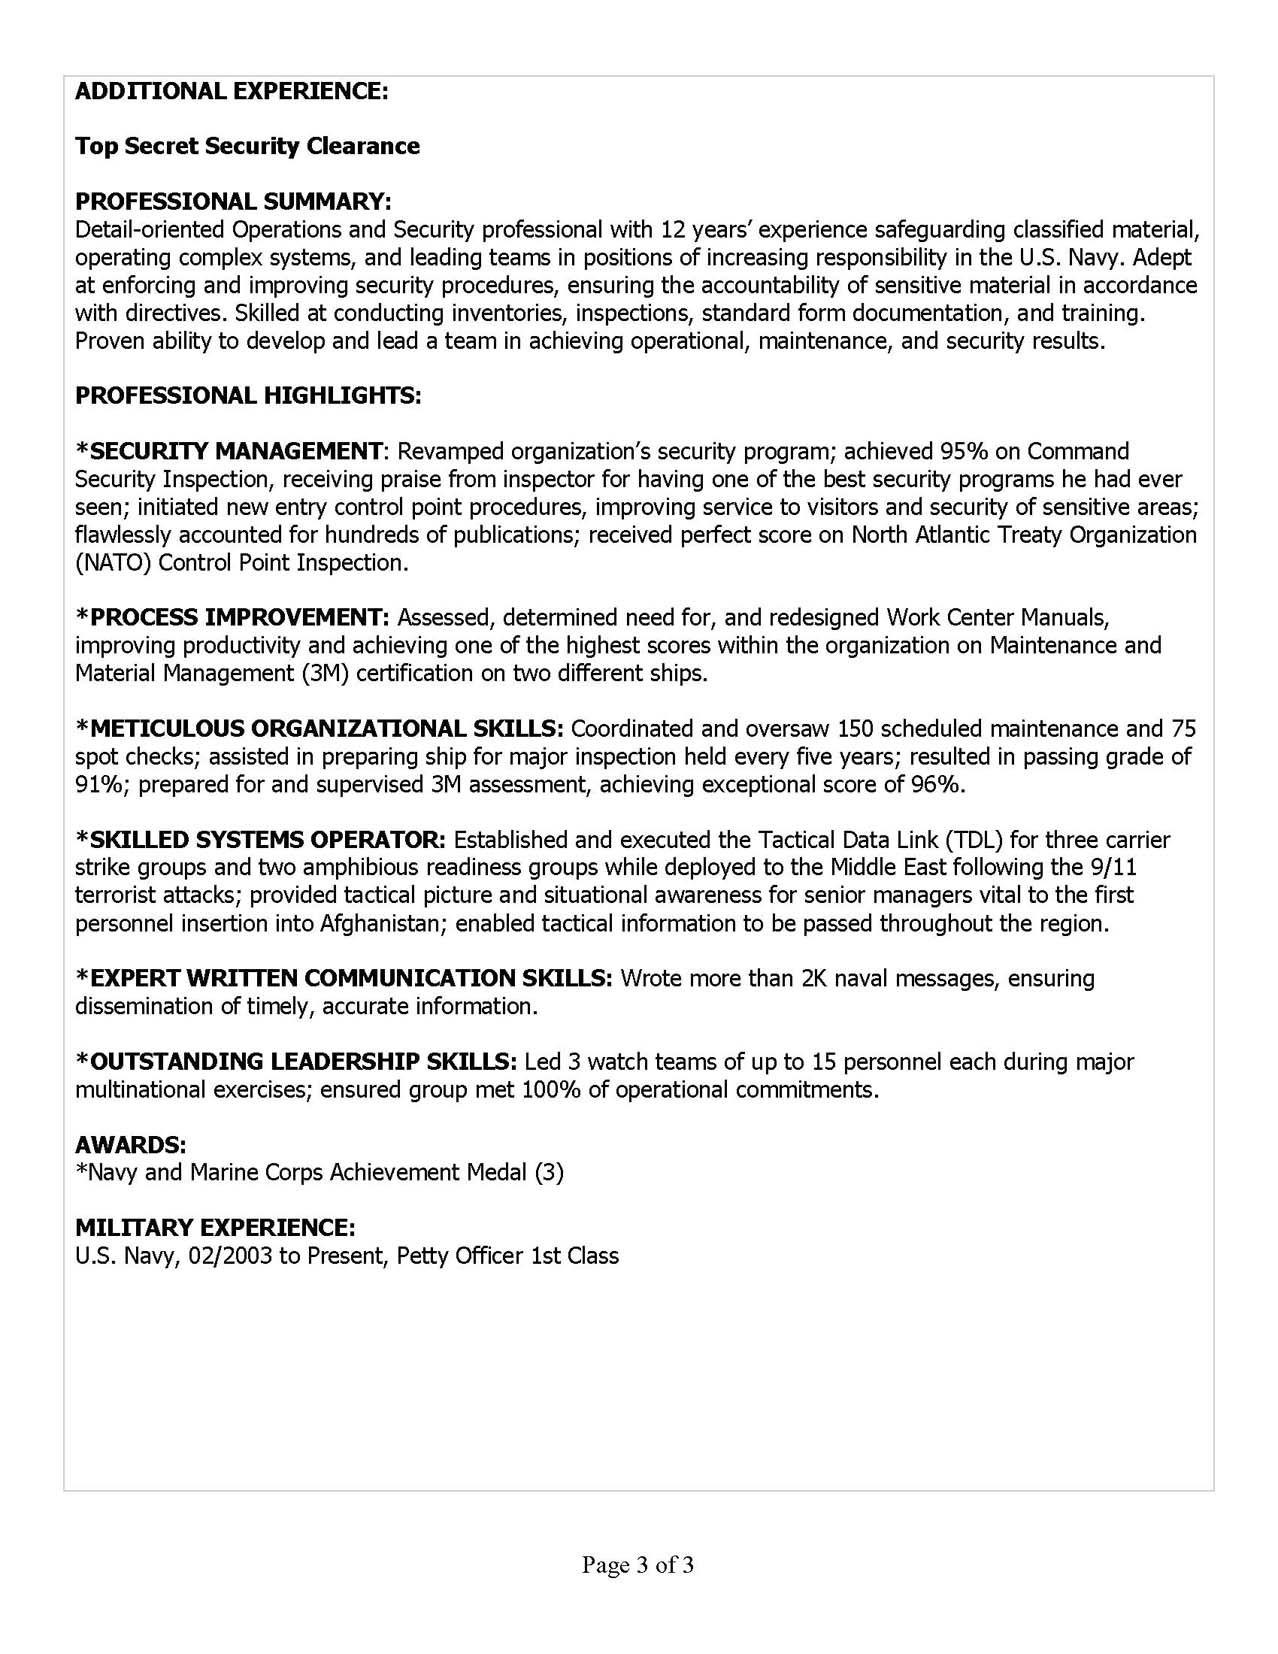 Military Resume Samples Examples In 2014 Job Resume Template Job Resume Resume Template